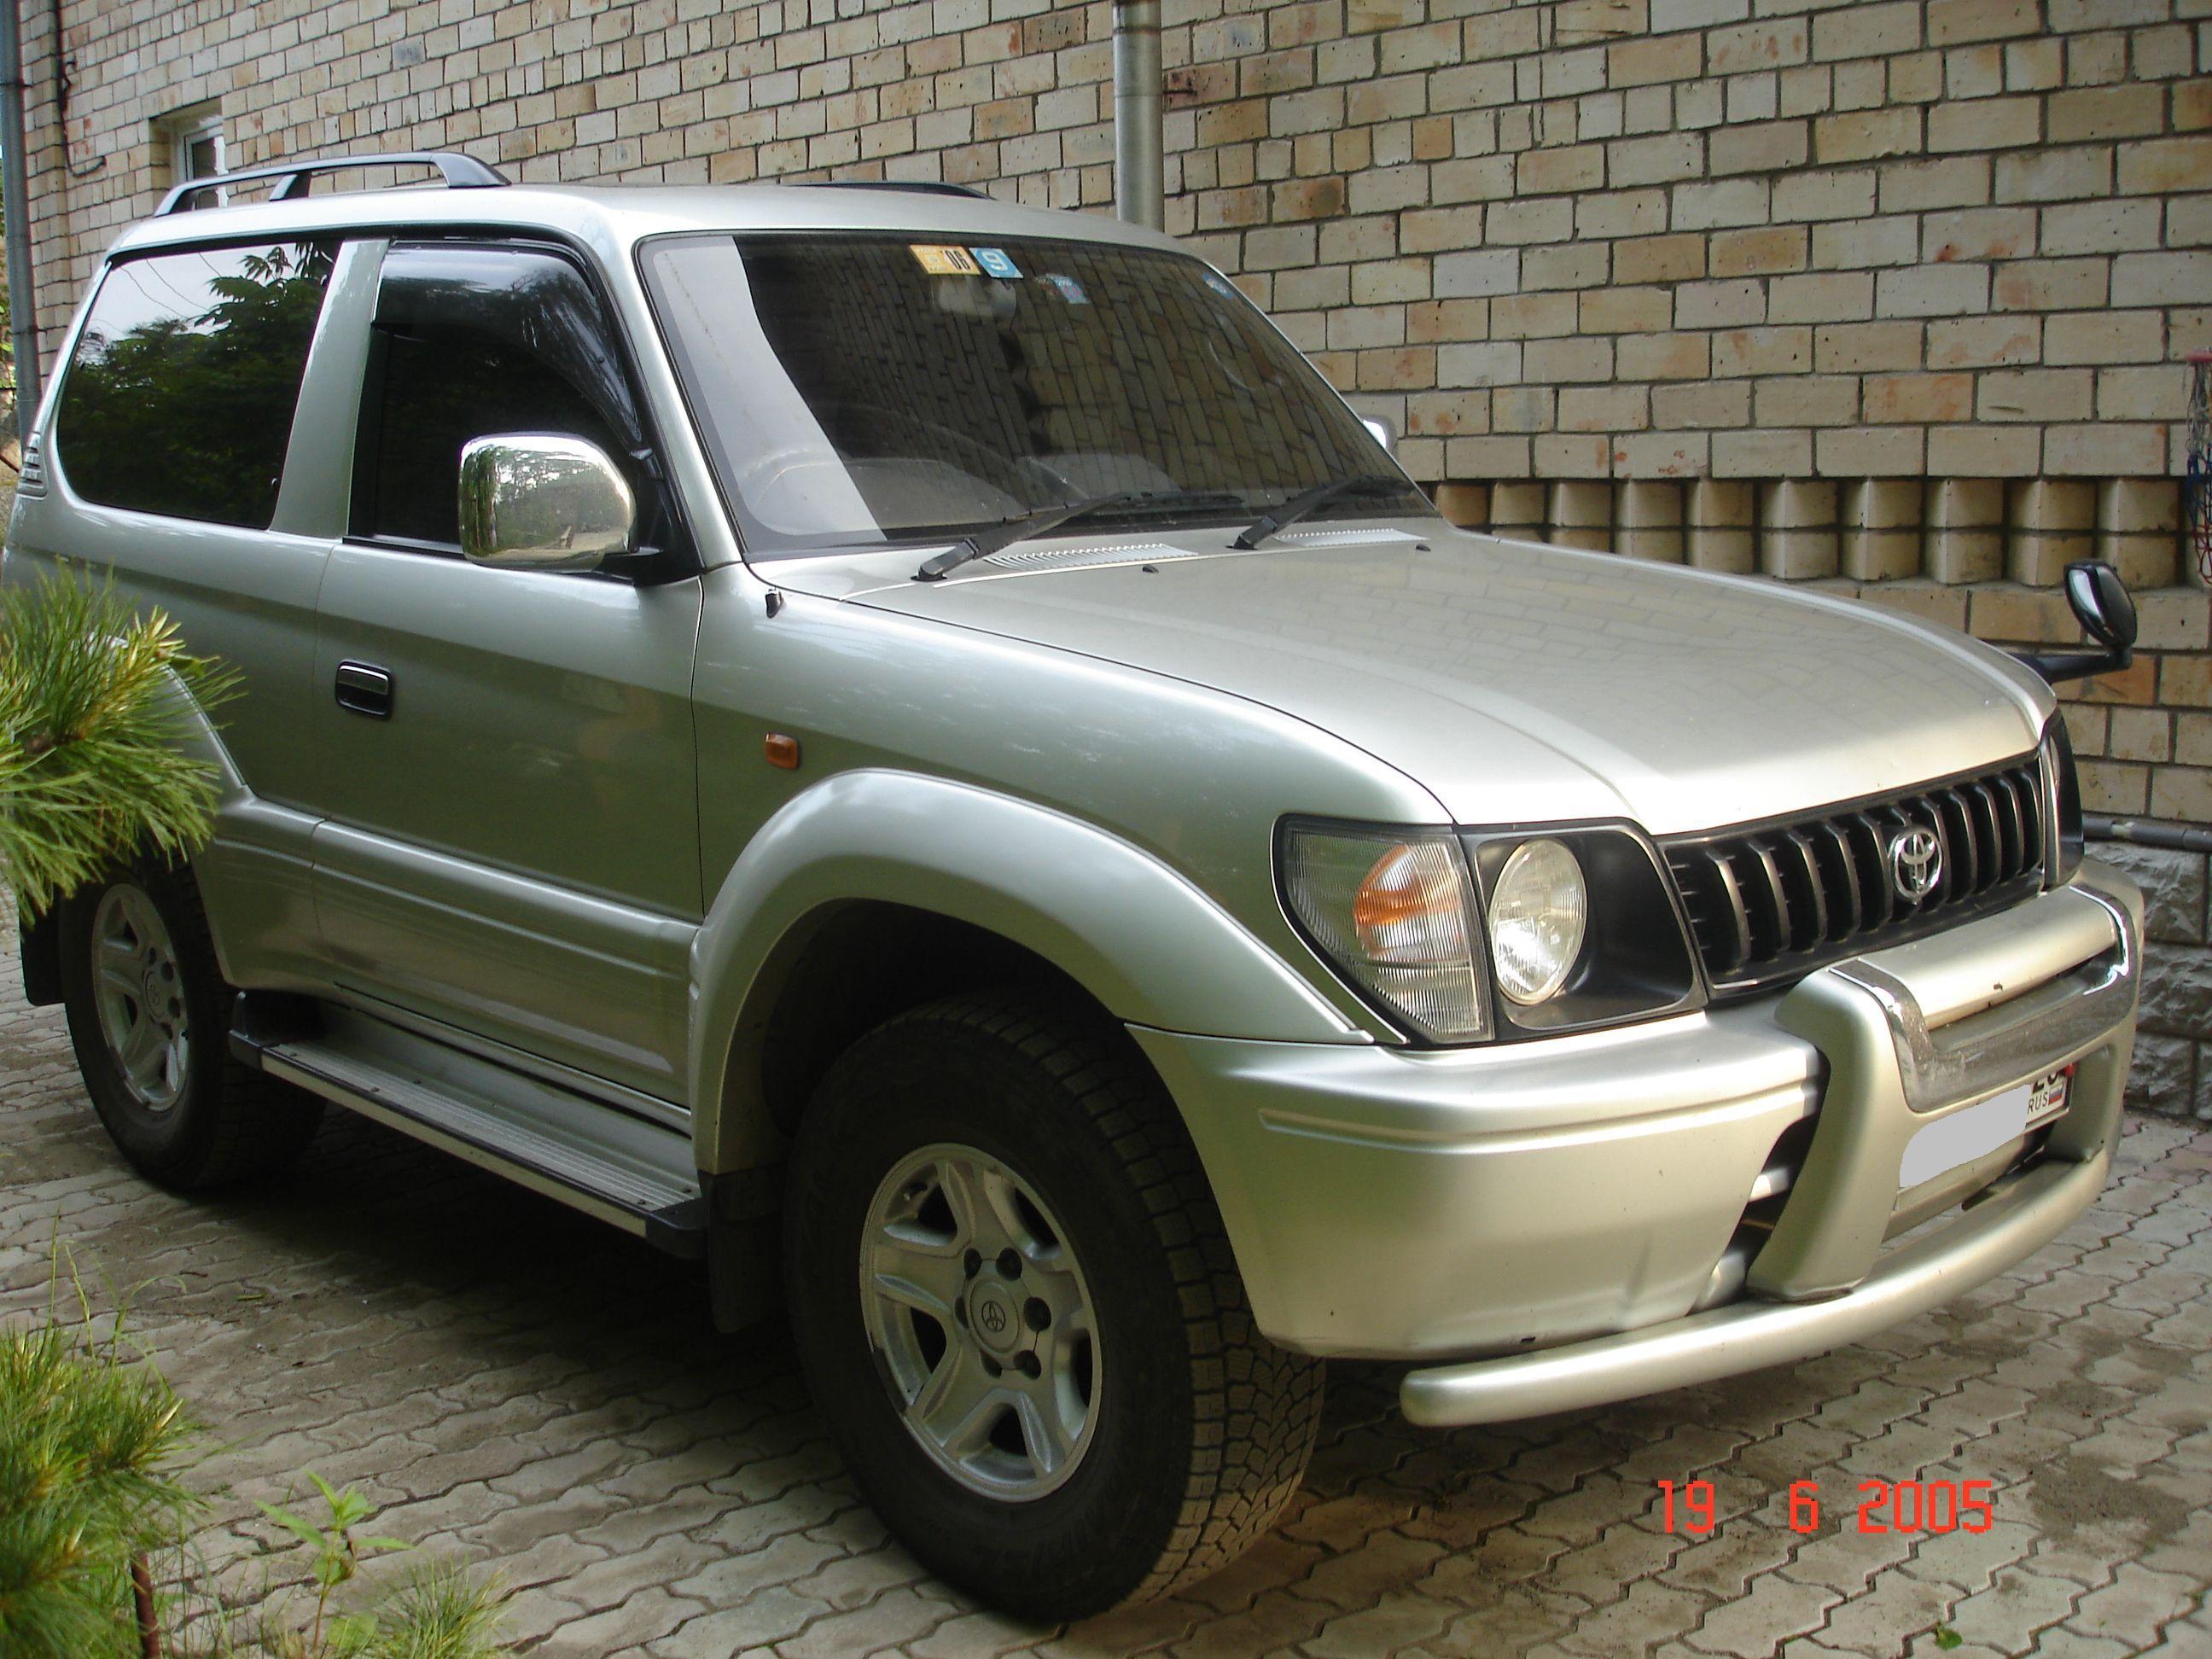 Toyota Land Cruzer >> 1998 TOYOTA LAND CRUISER - Image #6